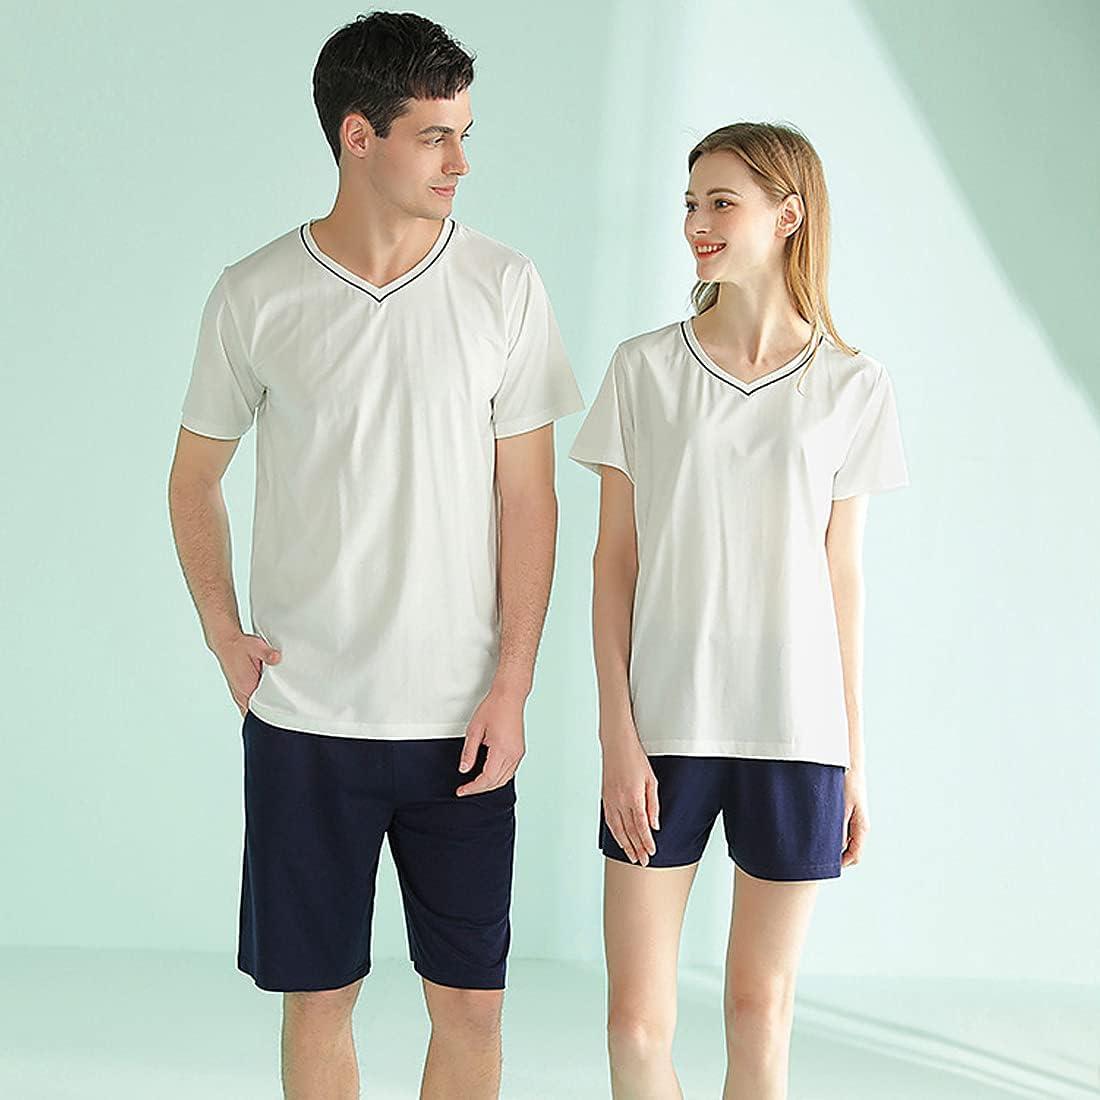 Summer Mens V neck Pajama Set Short Sleeve Shirt Shorts Sets Sleepwear Pjs Set Lightweight L-3XL